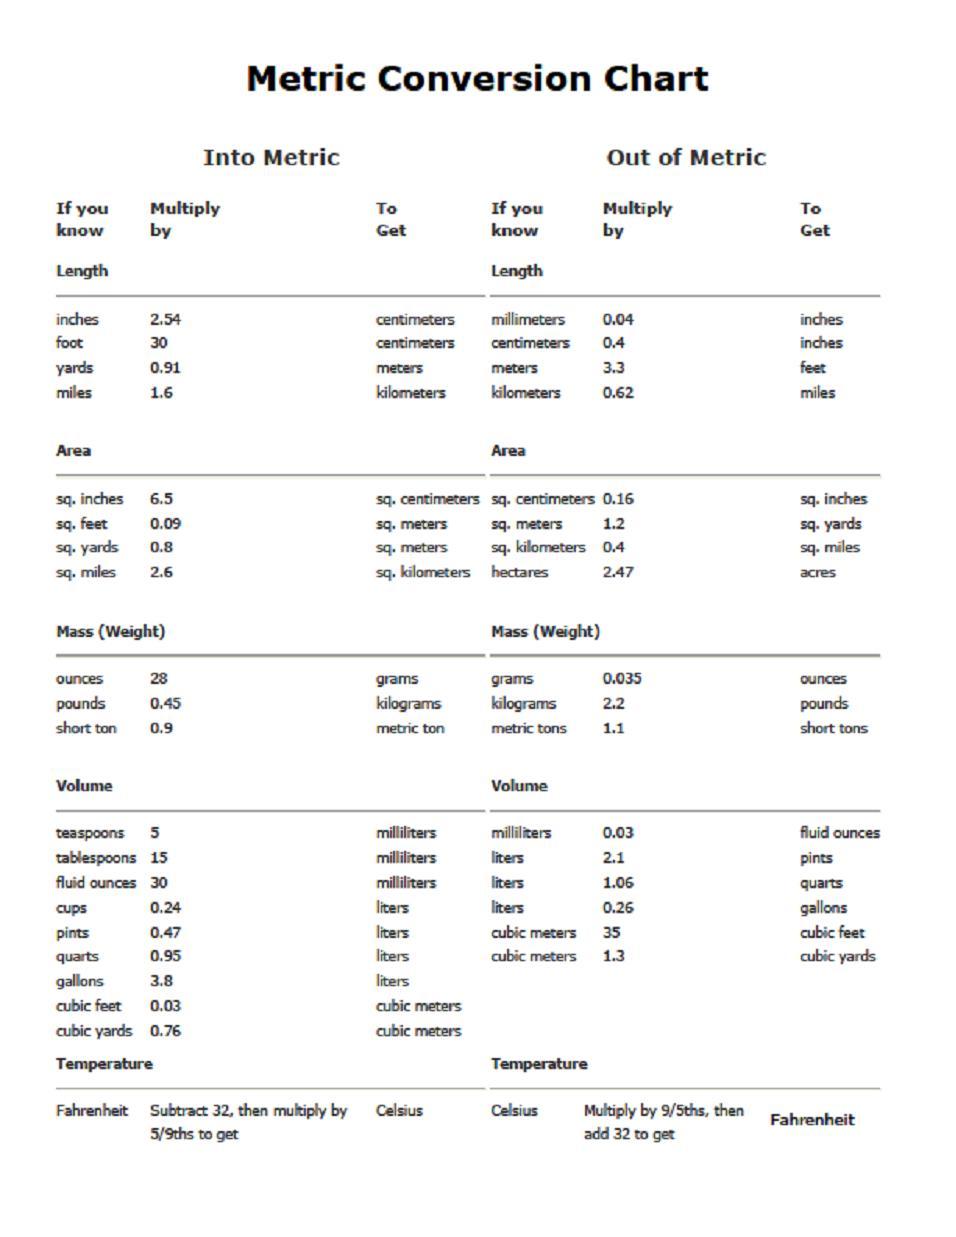 Free download Measurement Printable Metric Conversion Chart ...